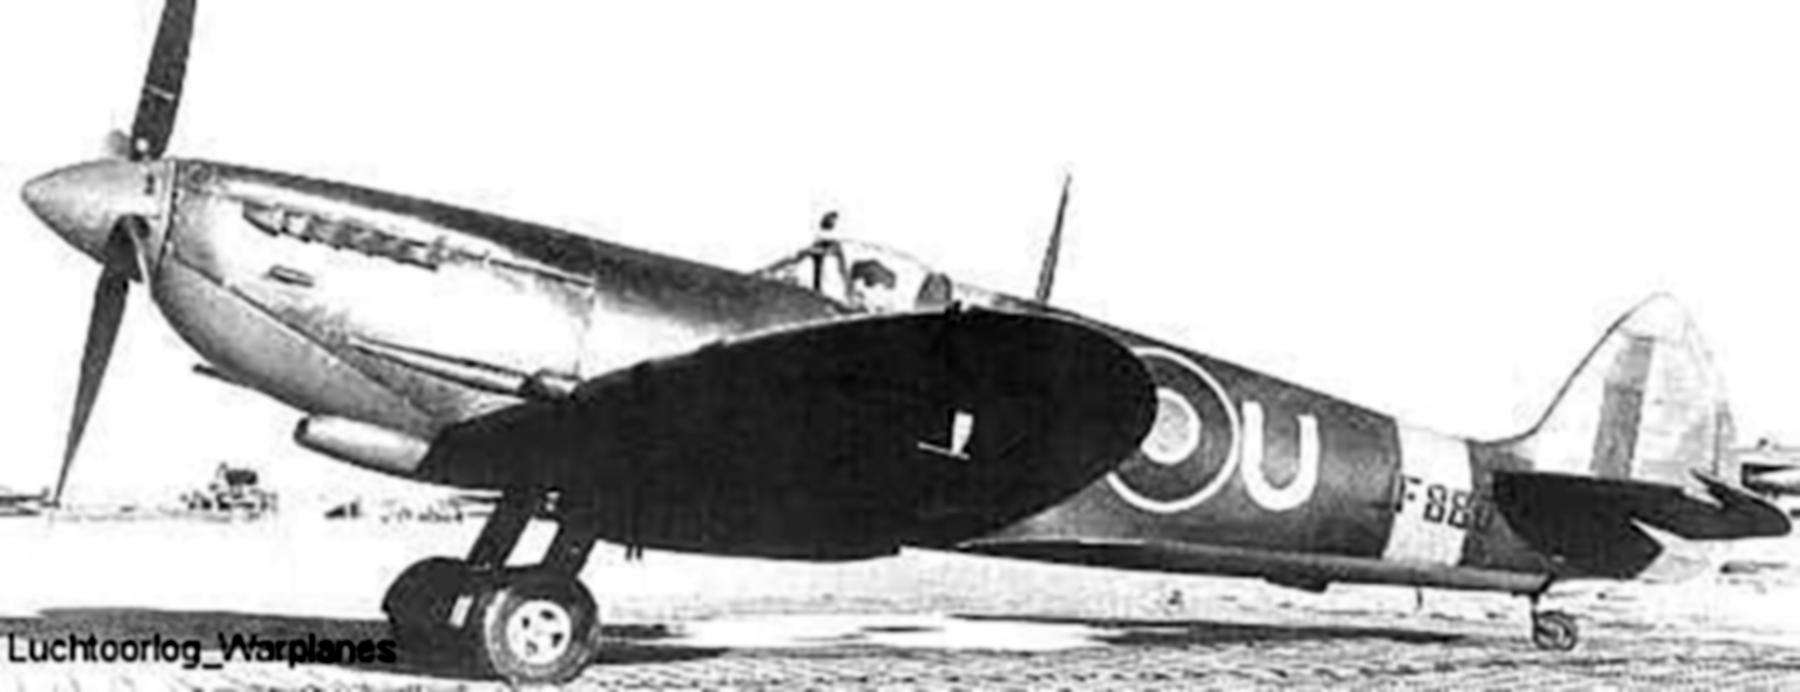 Spitfire LFVIII RCAF 417Sqn ANU JF880 01